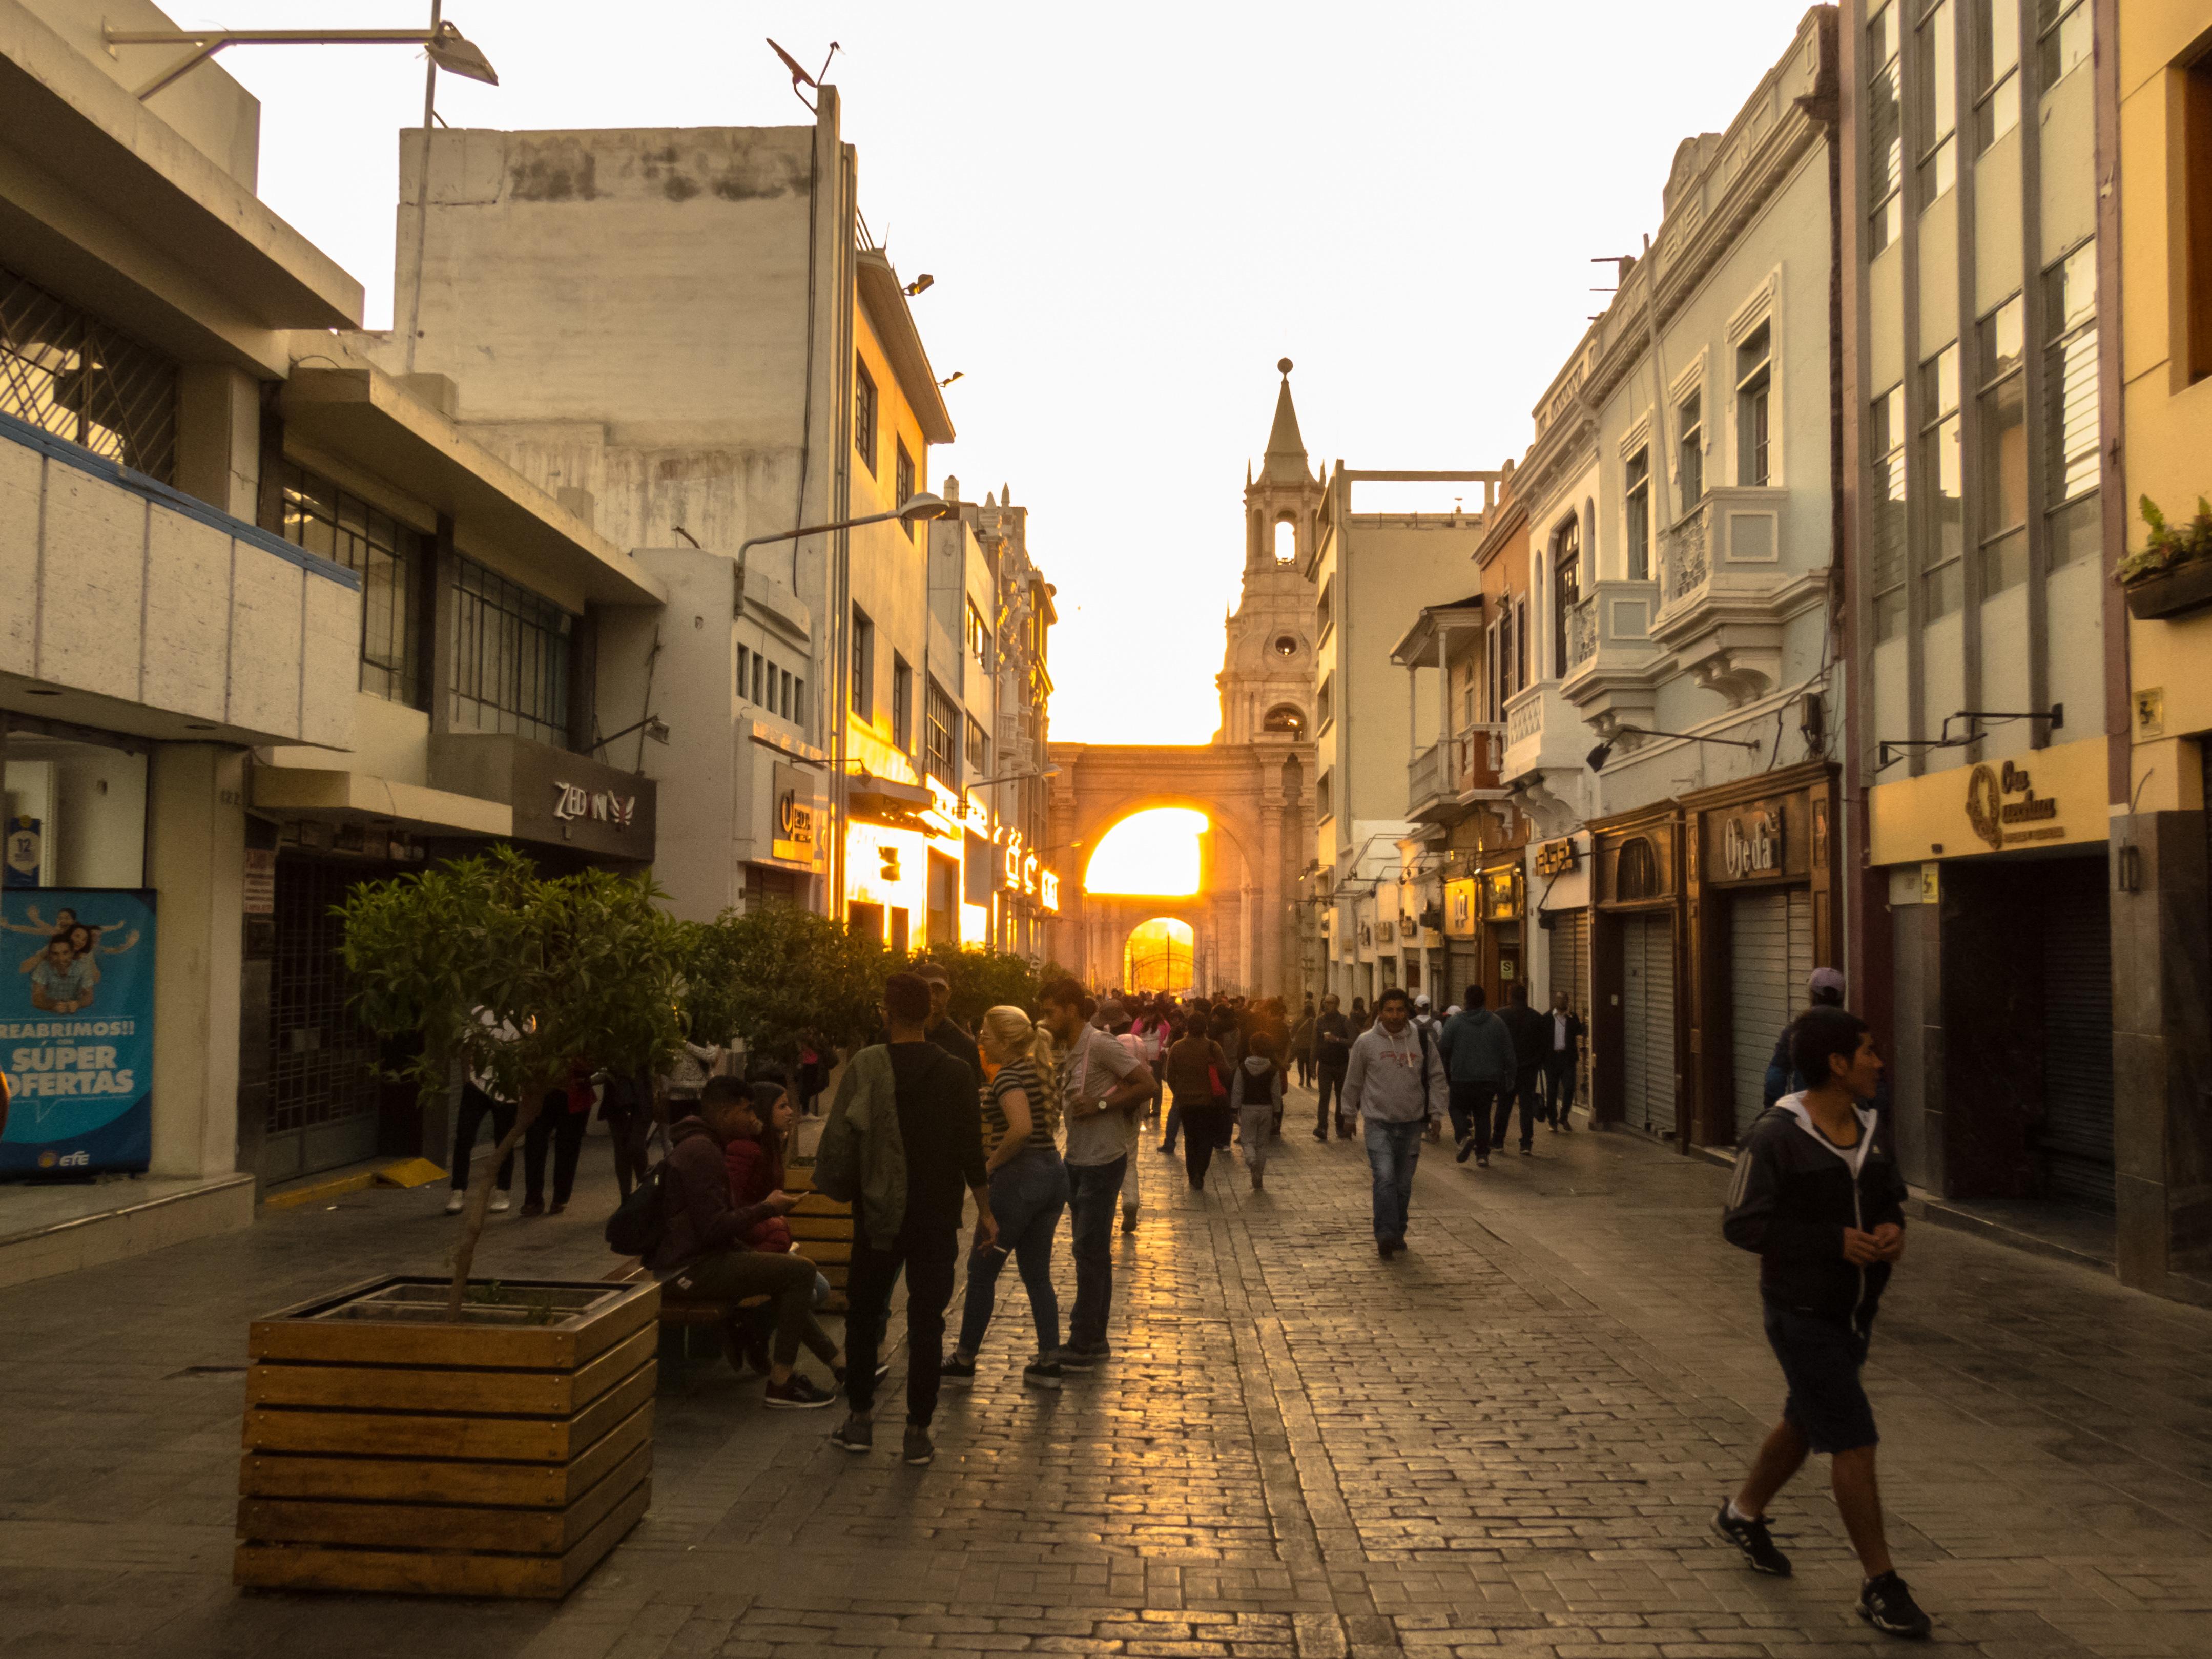 File:Atardecer en la Calle Mercaderes.jpg - Wikimedia Commons